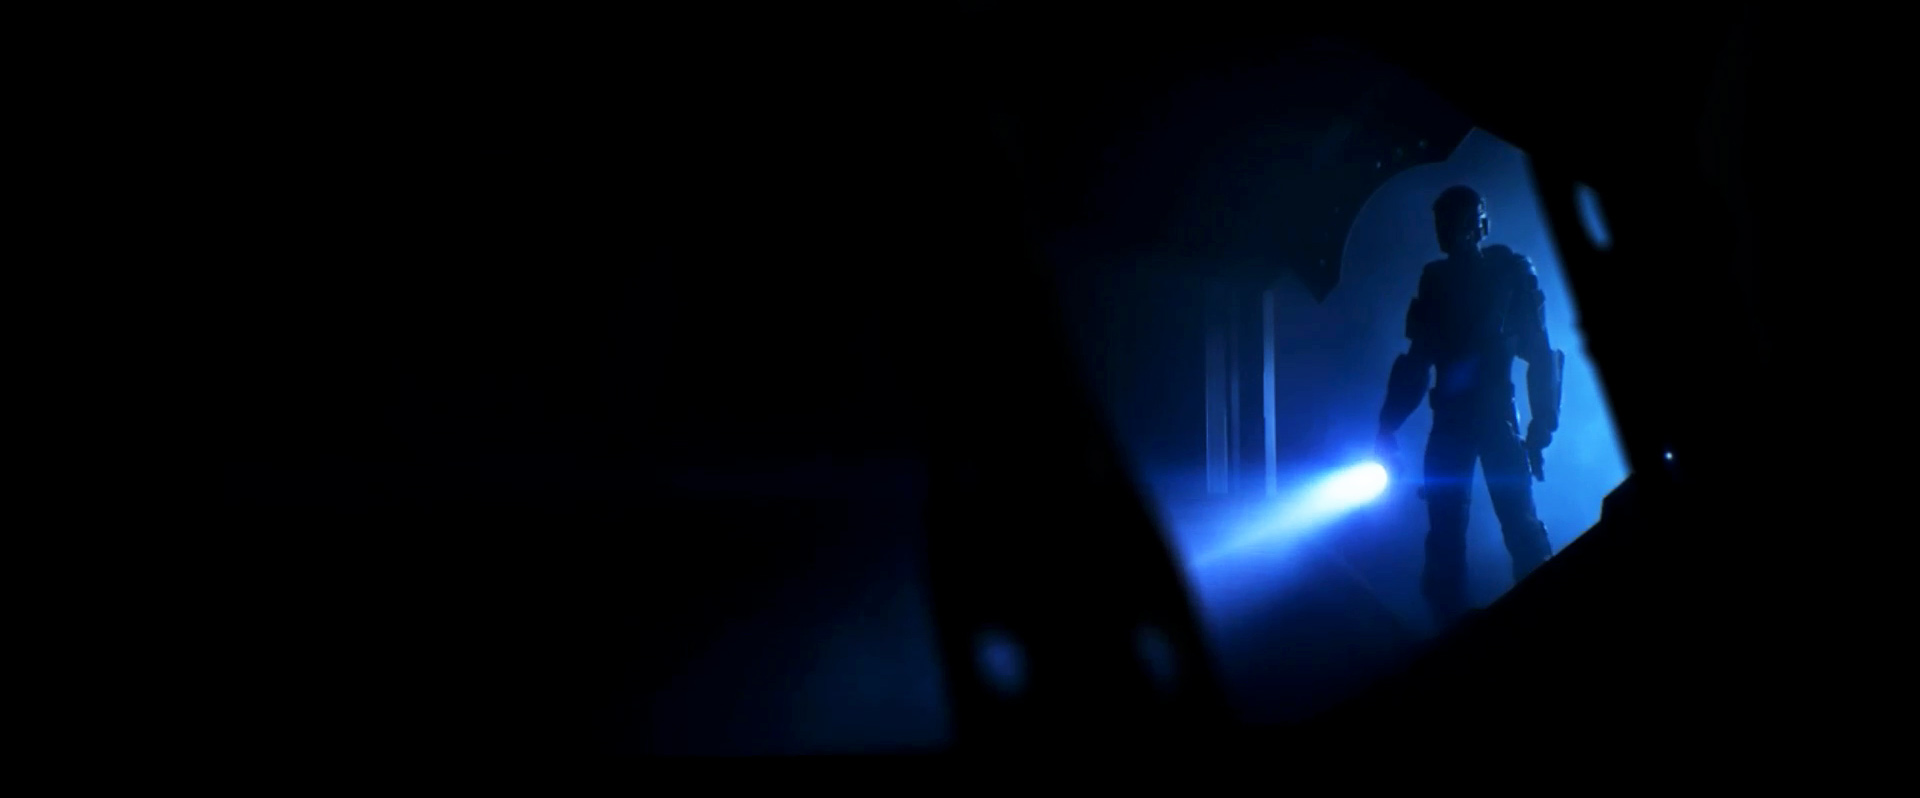 amazingly-cool-sci-fi-short-film-azarkant-3.jpg